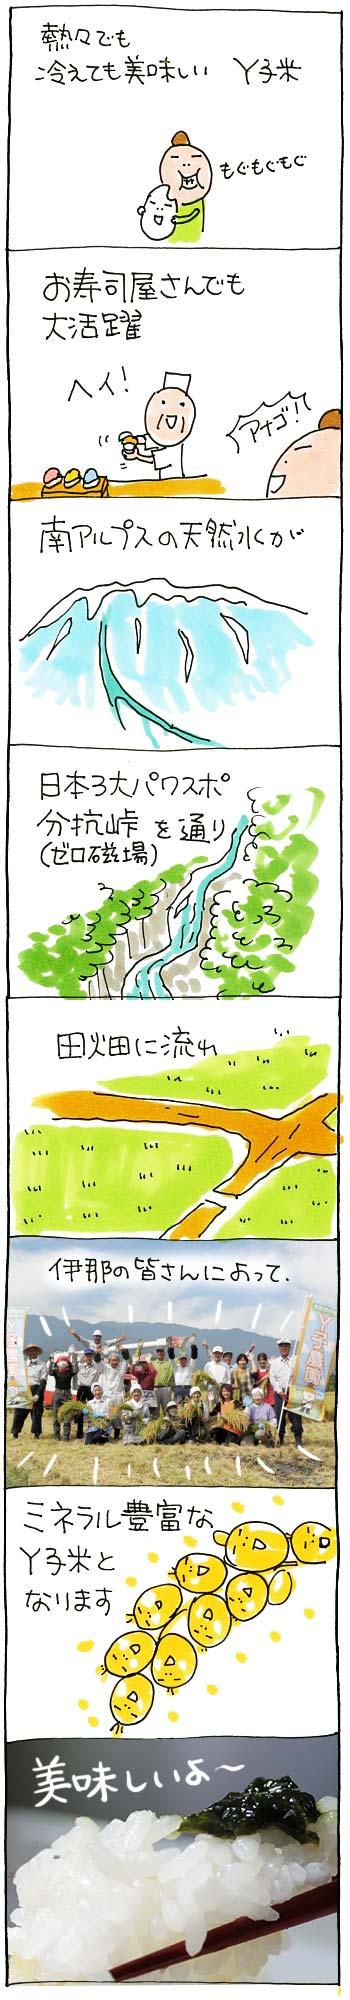 2014Y子米